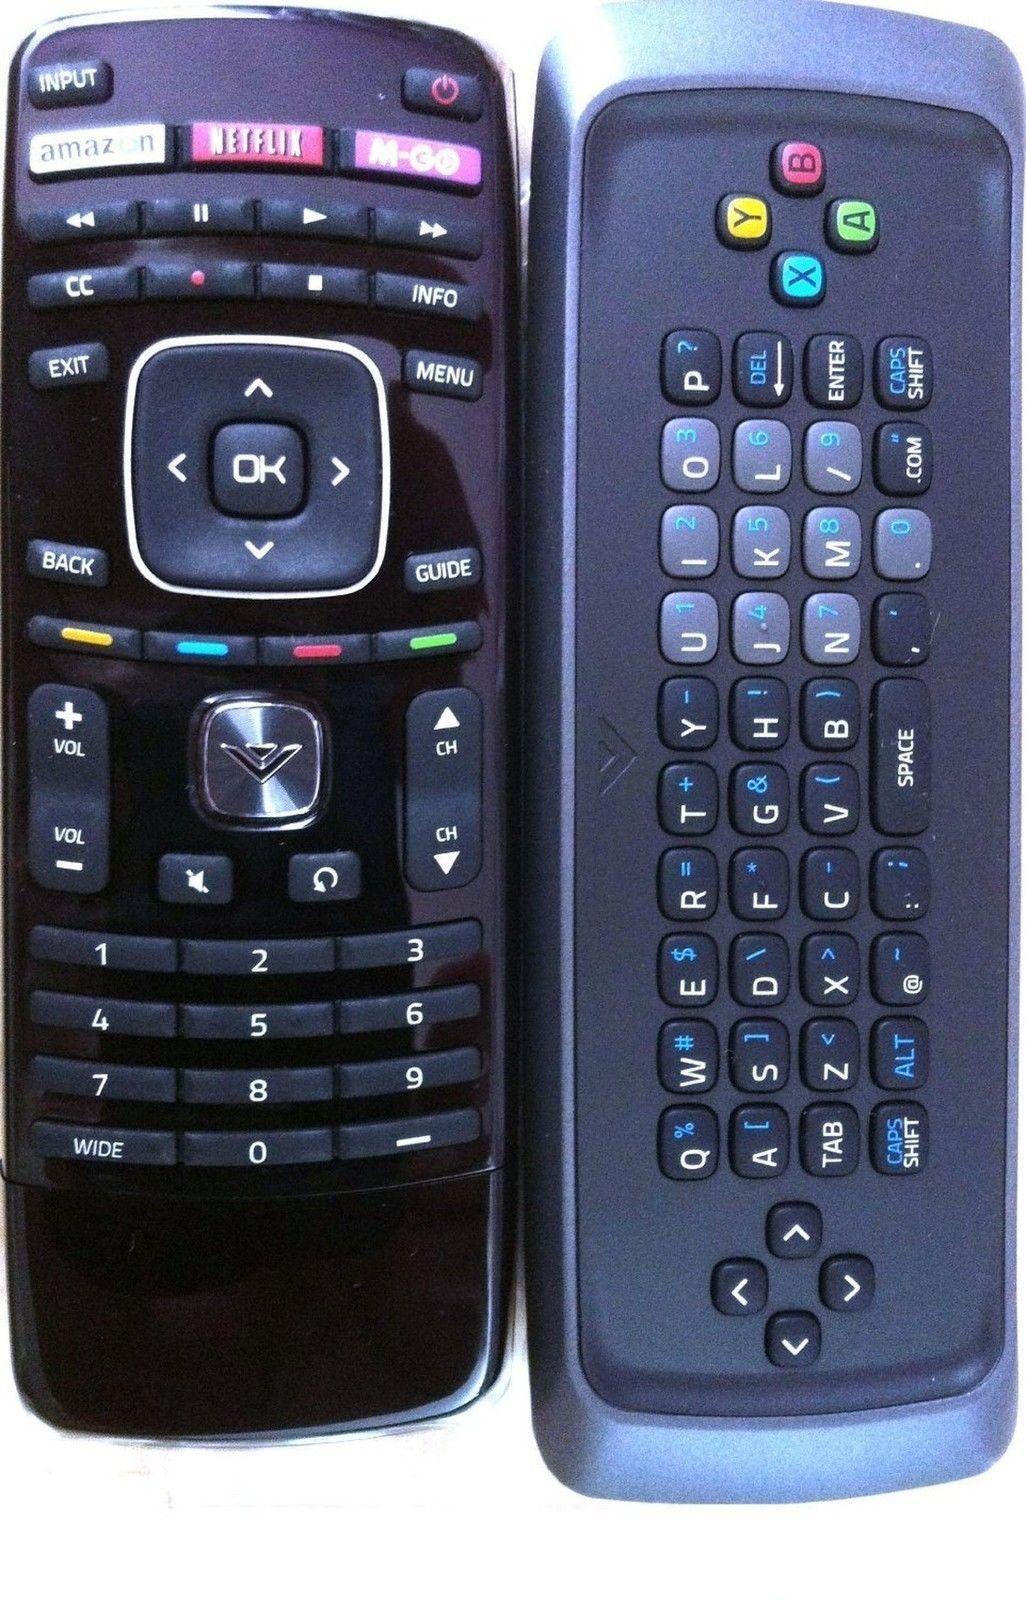 New! Original VIZIO XRT300 Qwerty keyboard remote for